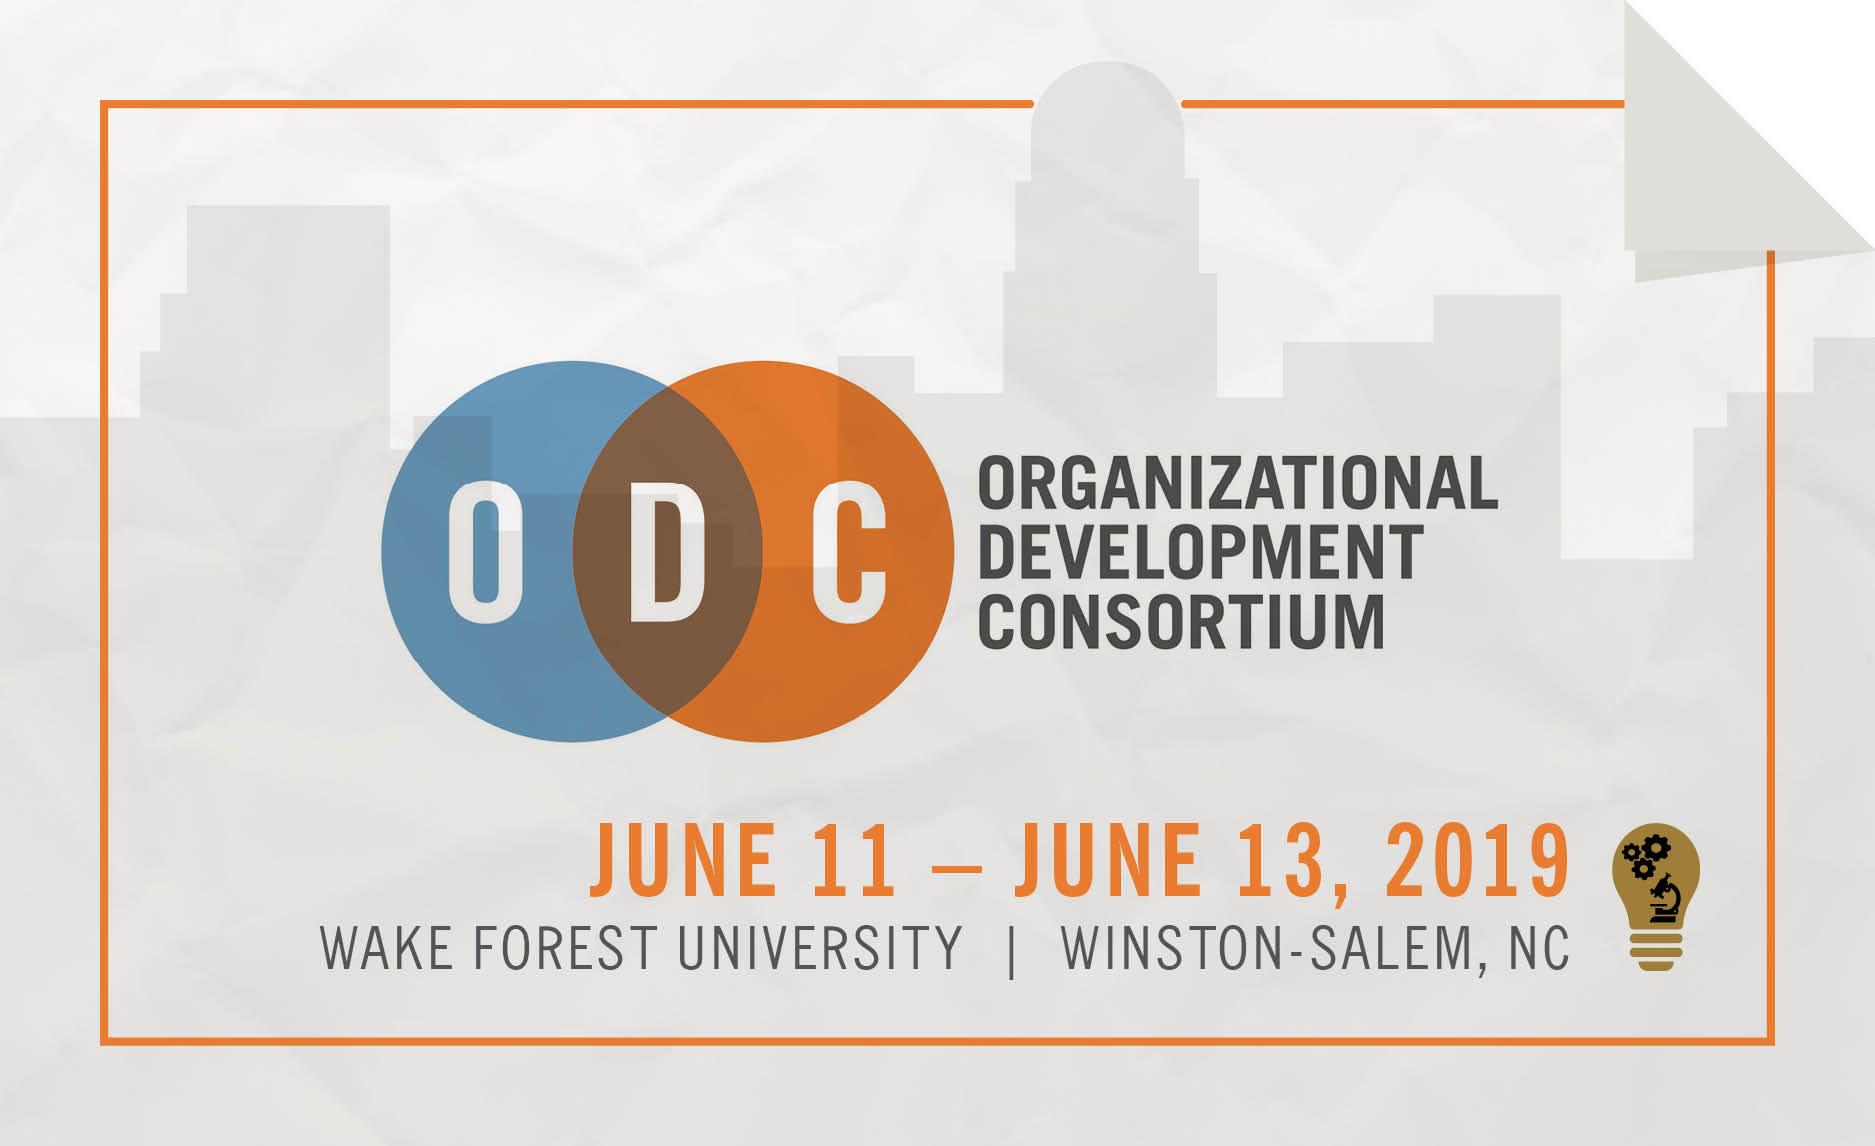 Organizational Development Consortium